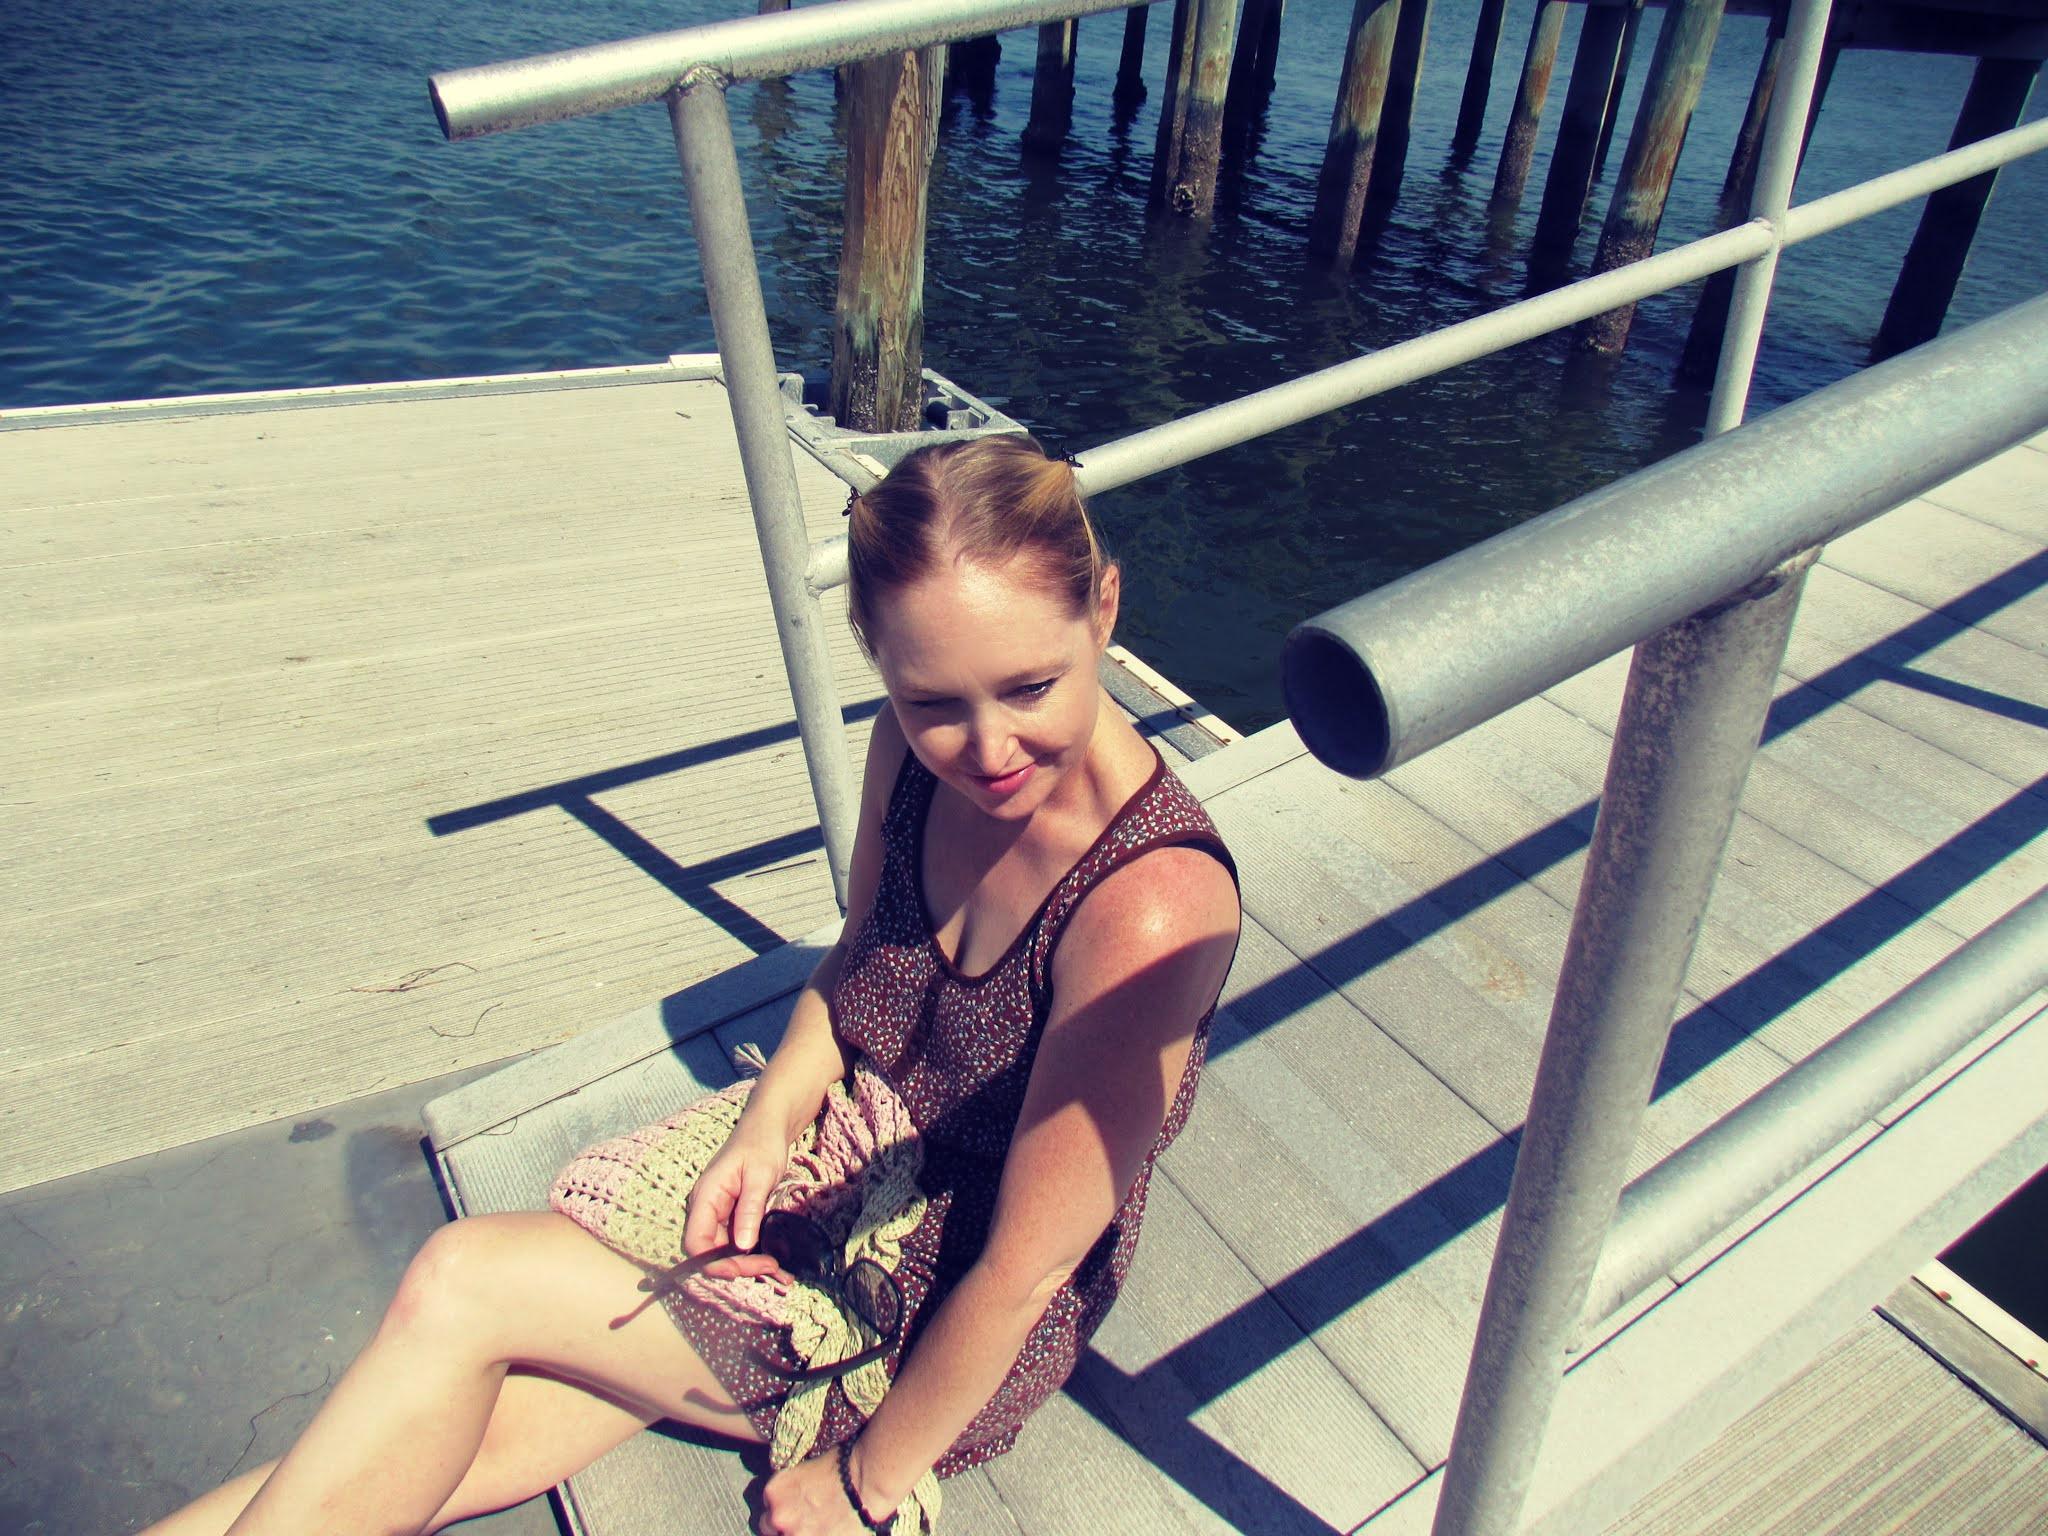 Josiah Cephus Weaver Park in Dunedin, Florida Summer at the Pier